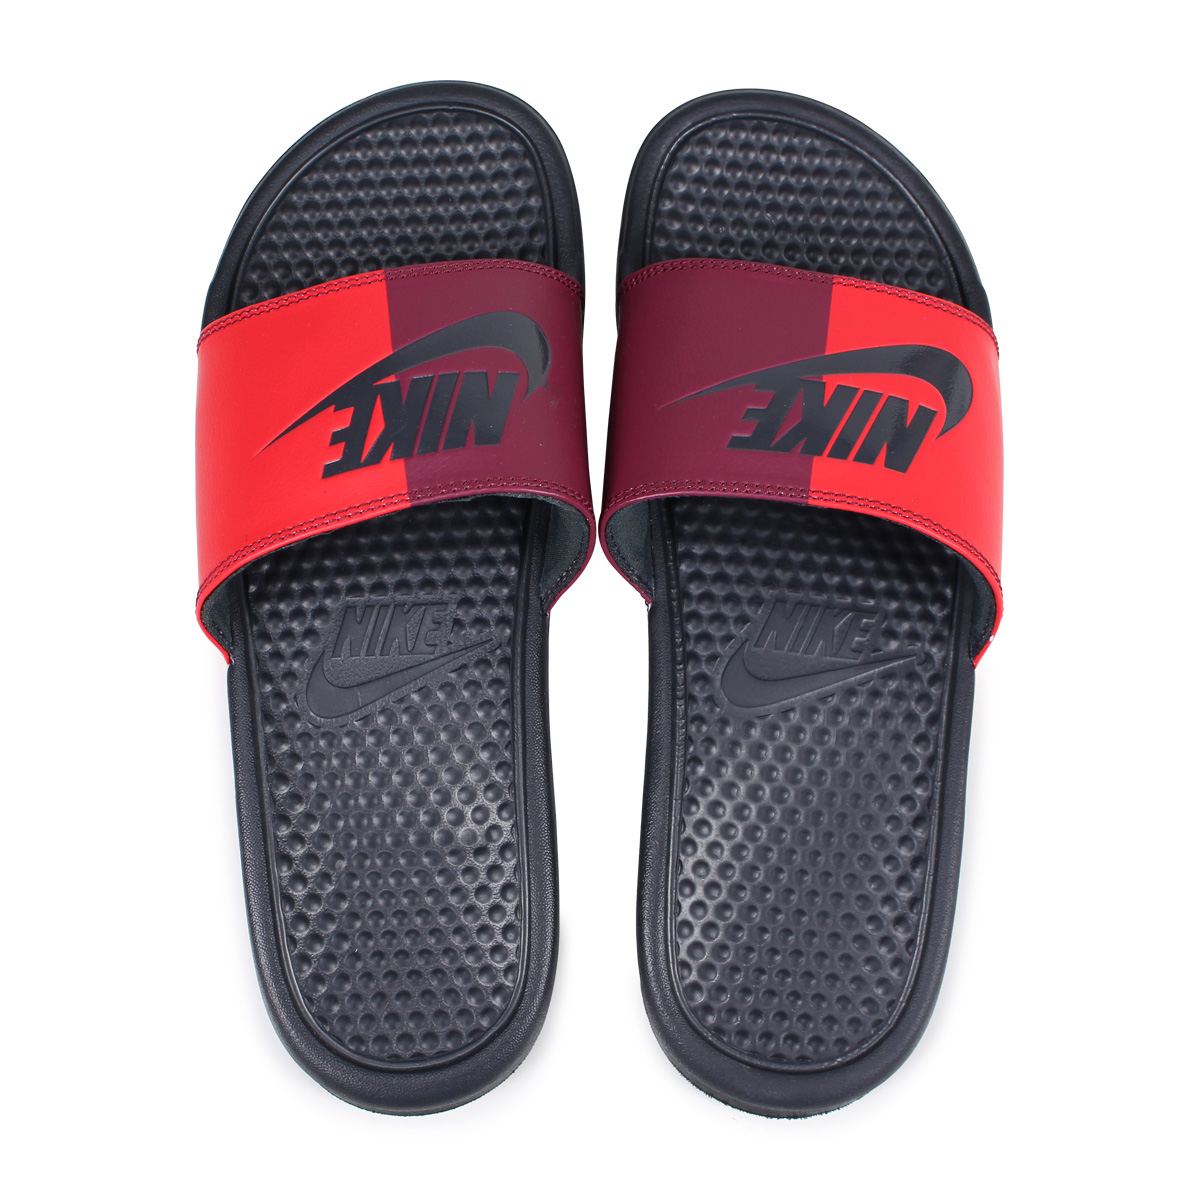 8adb33013993 Buy orange and black nike sandals